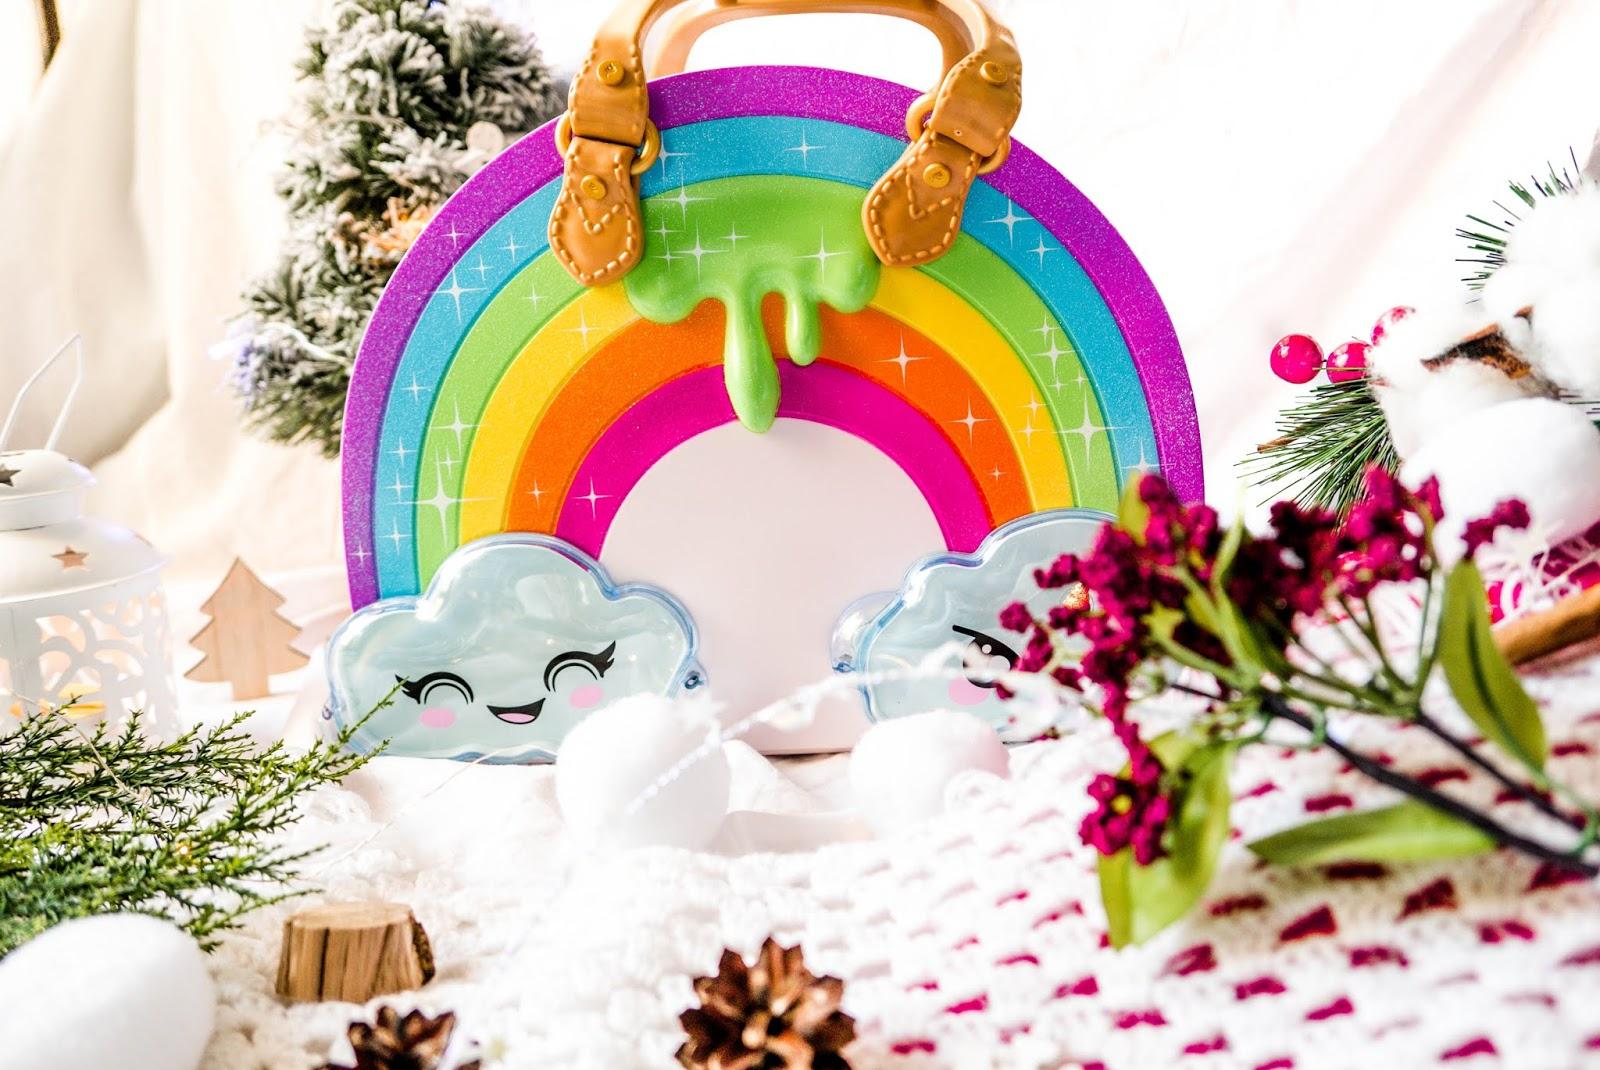 Poopsie Surprise - Kuferek z akcesoriami do tworzenia Slime - Chasmell Rainbow